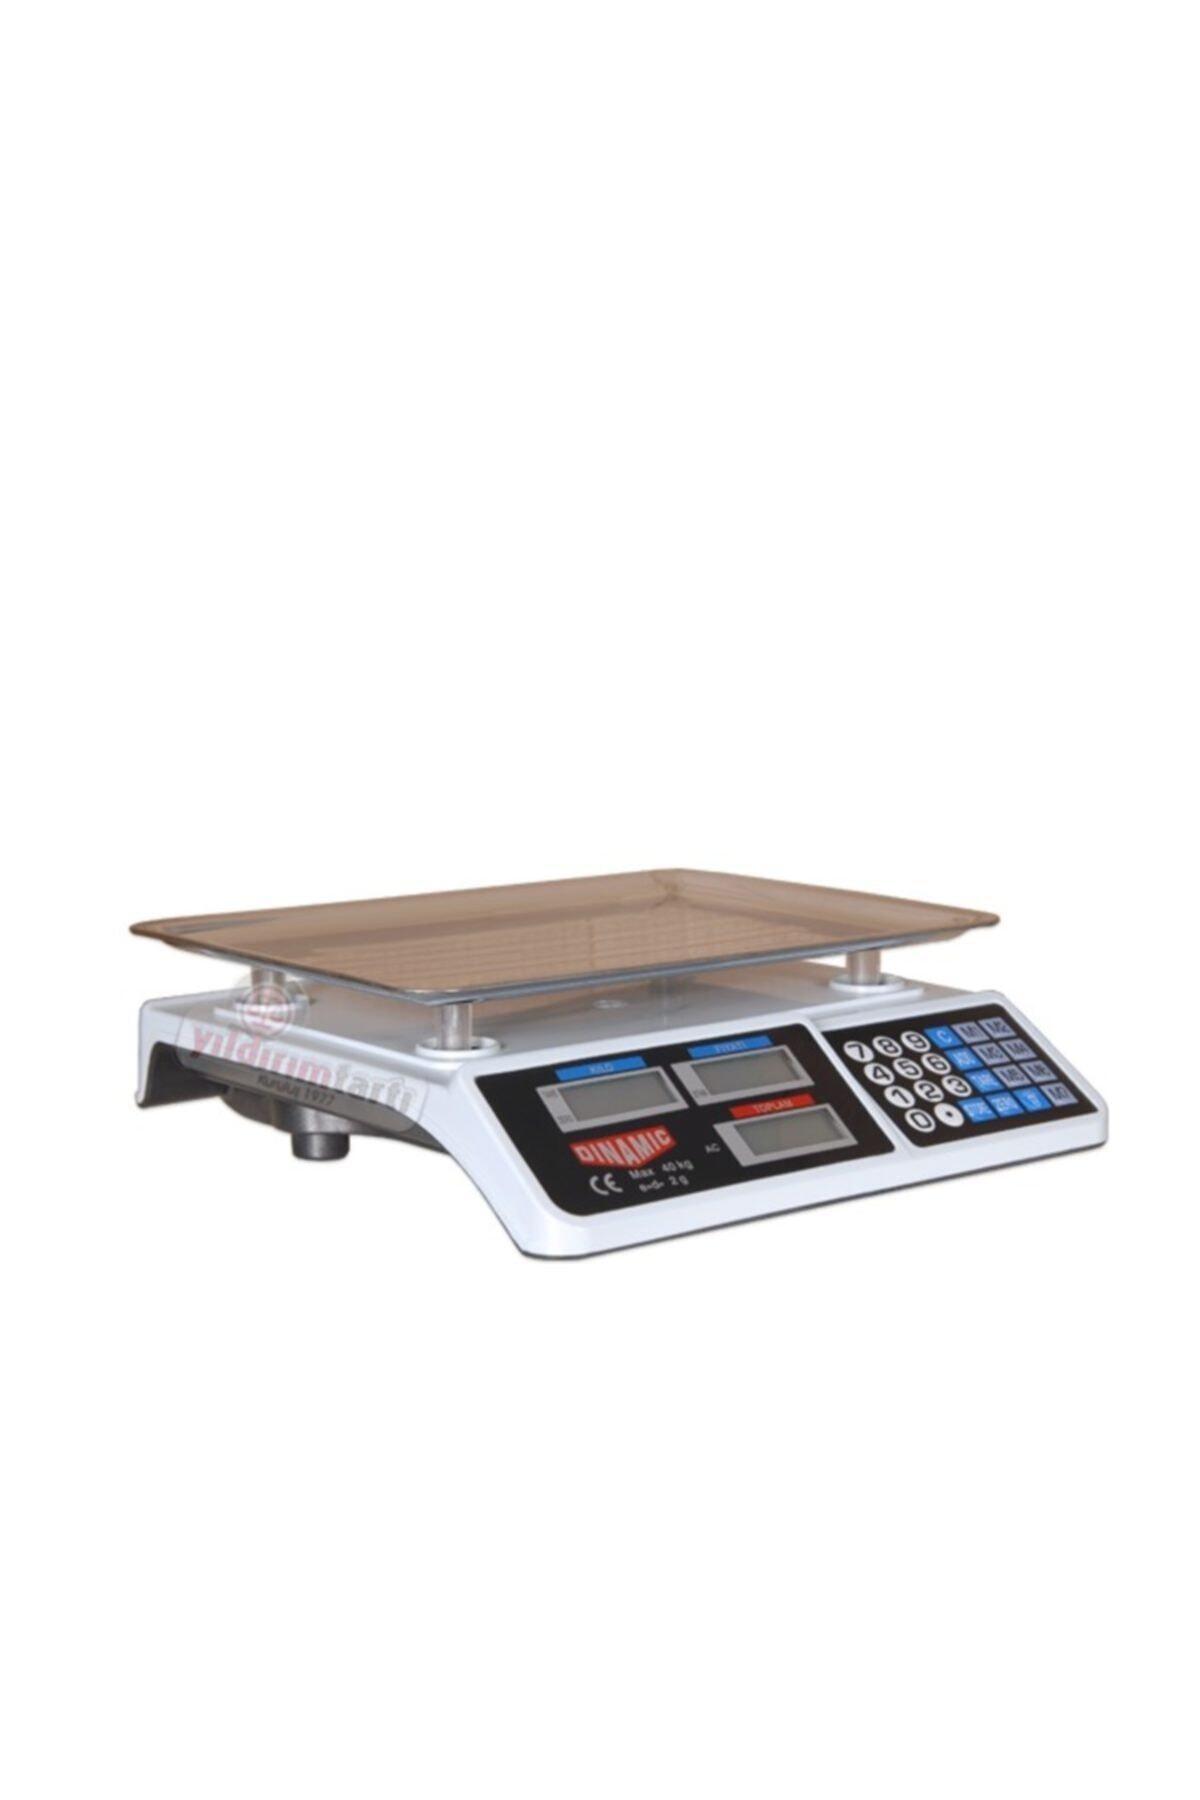 Dinamic Terazi Bakkal Manav Market Ve Pazarcı Tartıcı Max.40 Kg 2.gr Hassasiyet 2